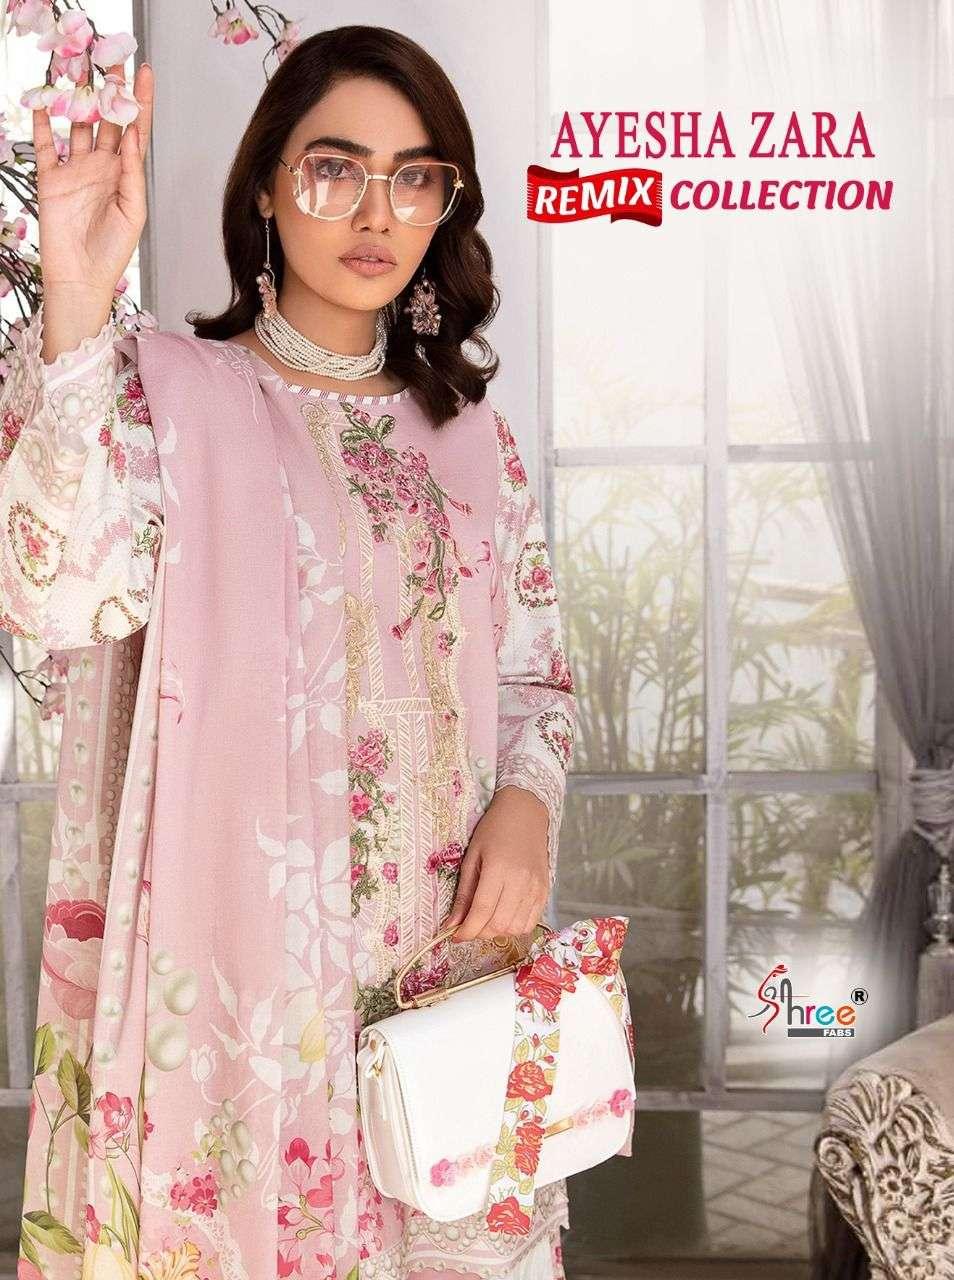 Shree Fabs Ayesha Zara Remix Collection Exclusive Pakistani Suit Catalog Buy Online